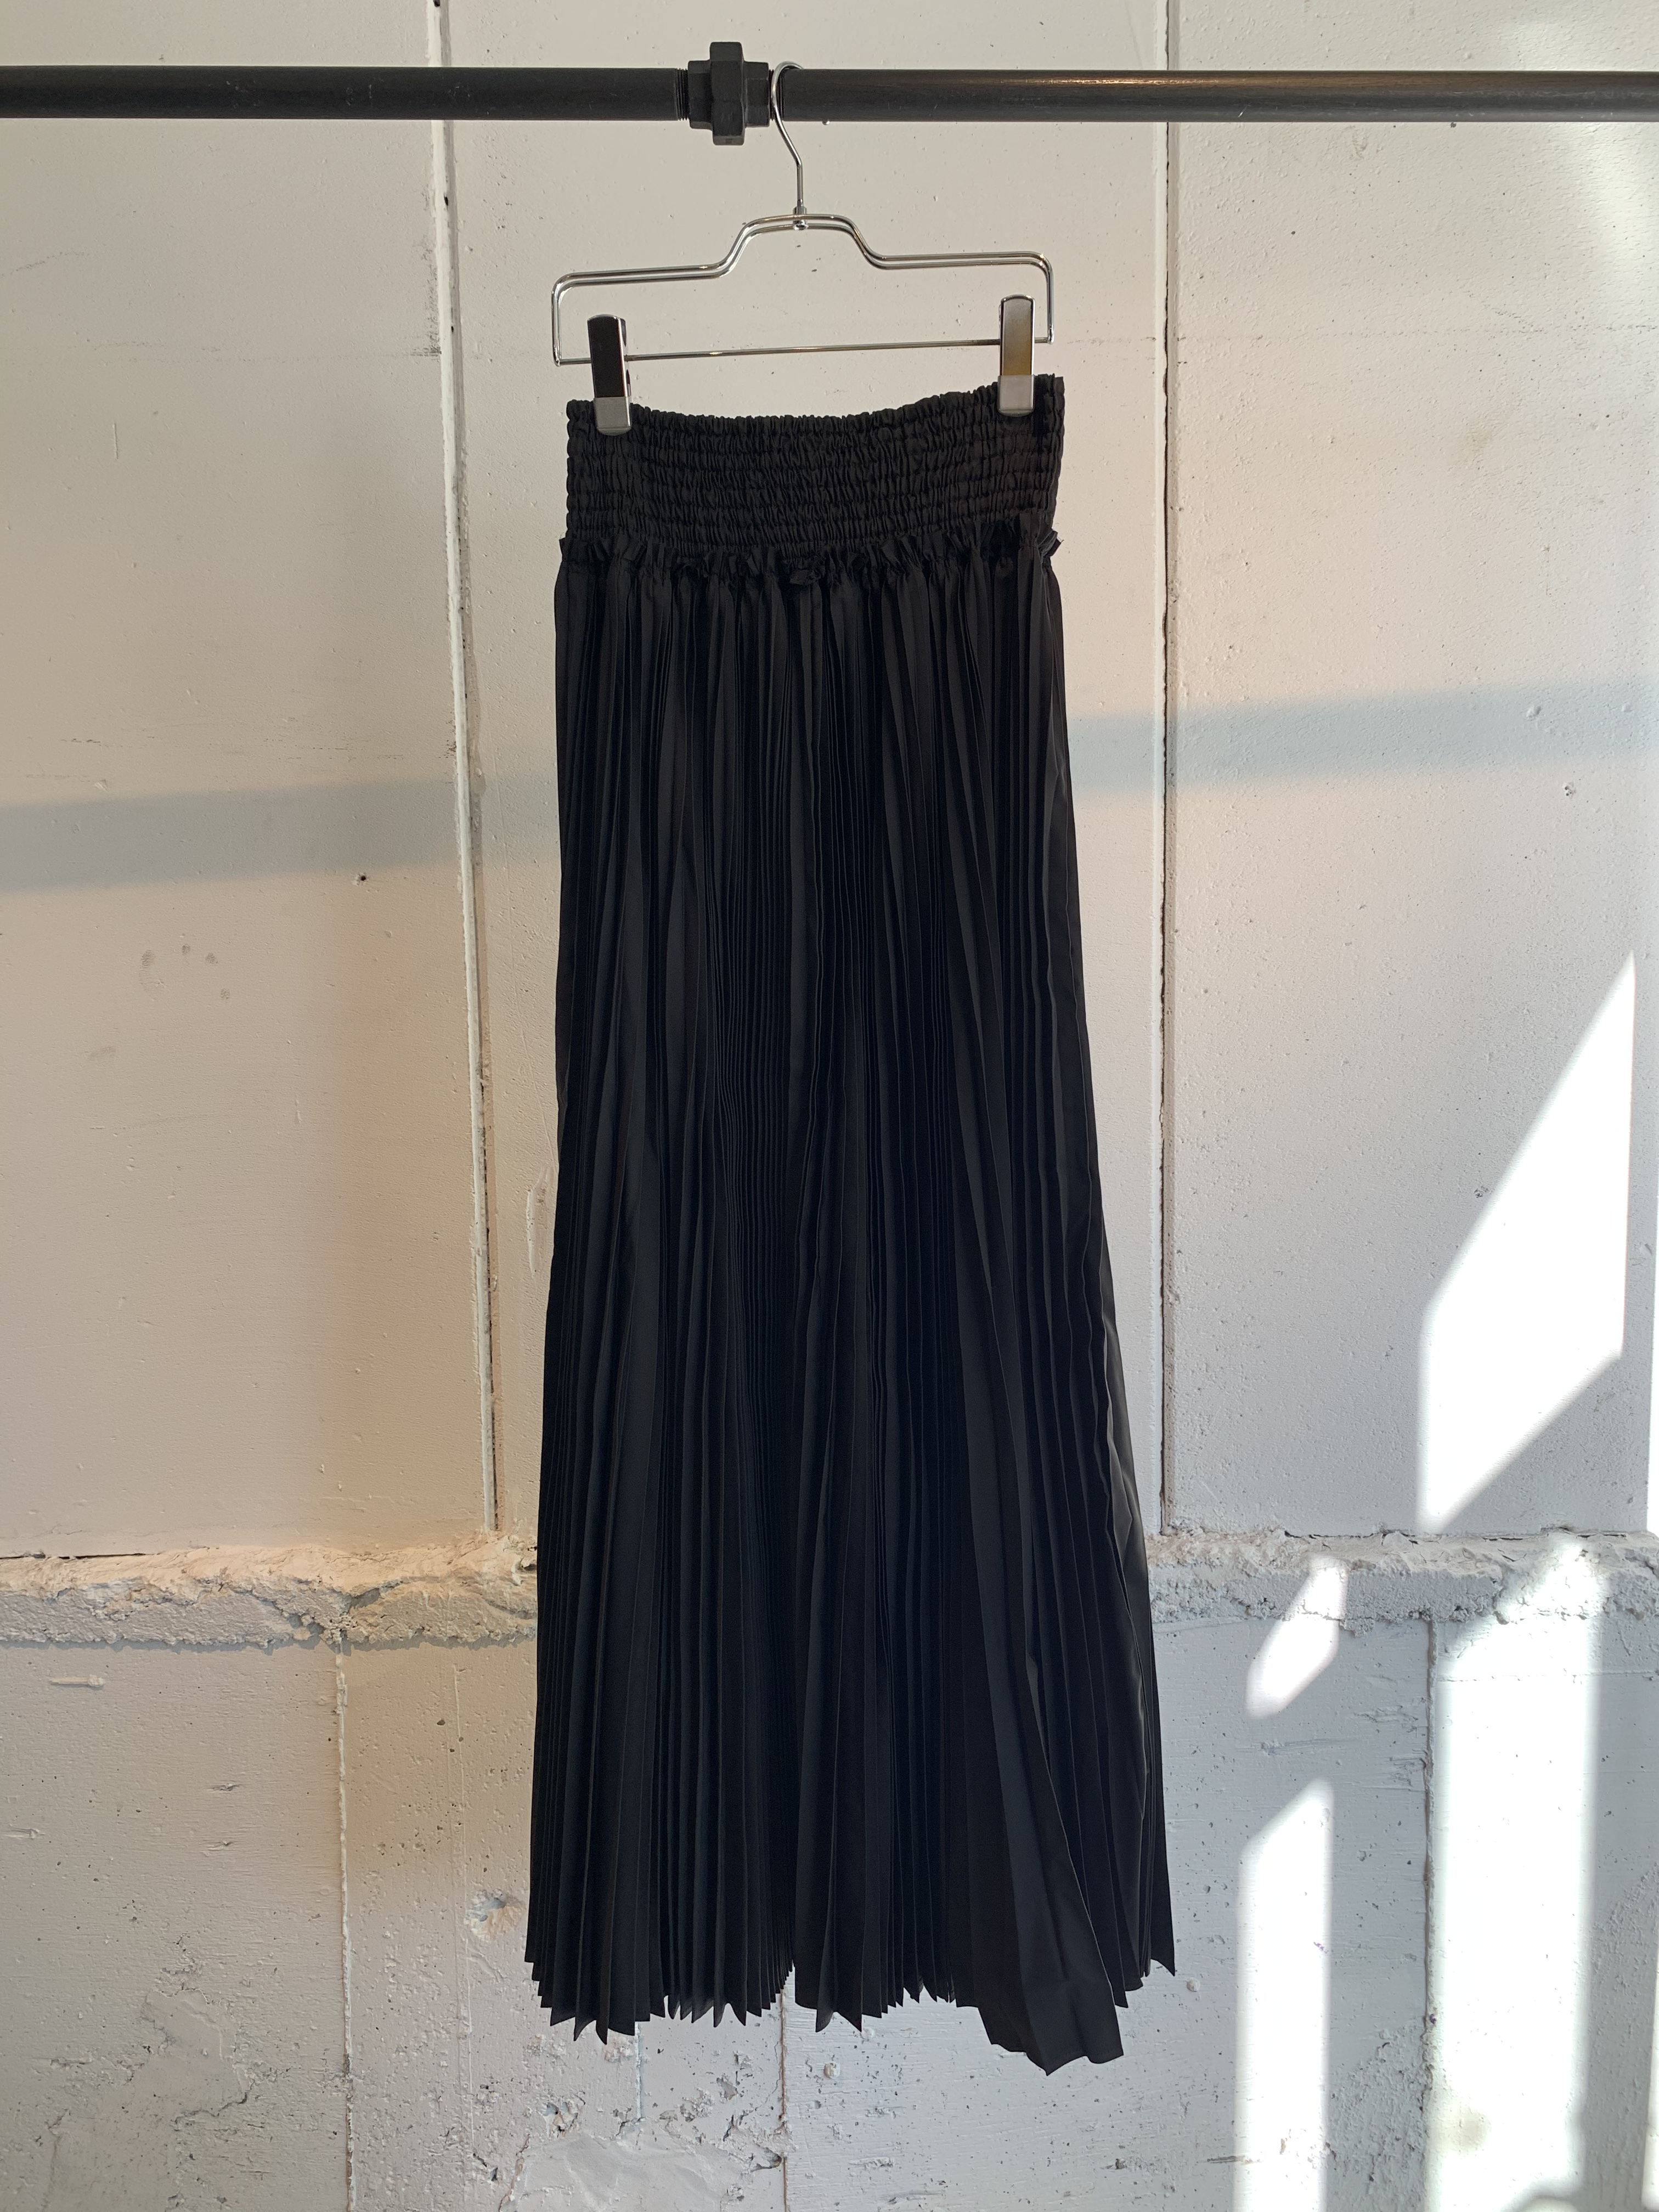 Chika kisada    pleats skirt